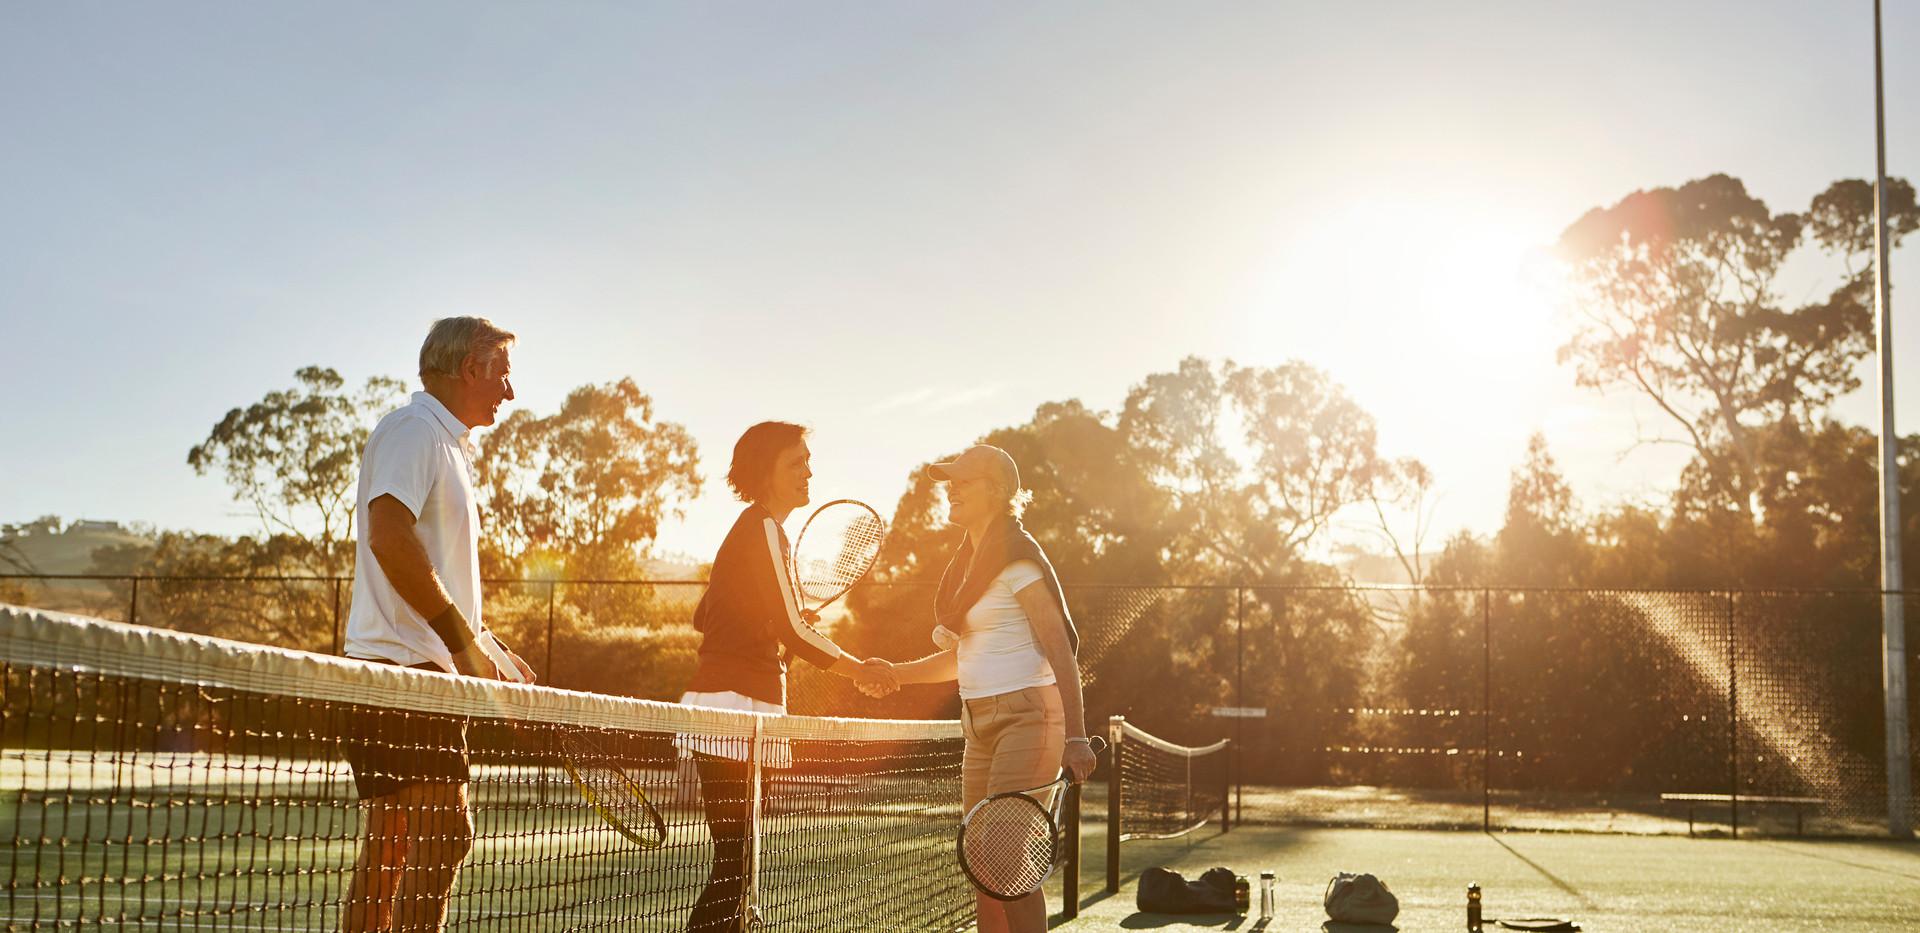 residents enjoying a game of tennis during sunset at the premium facilities at La Dimora Retirement Village